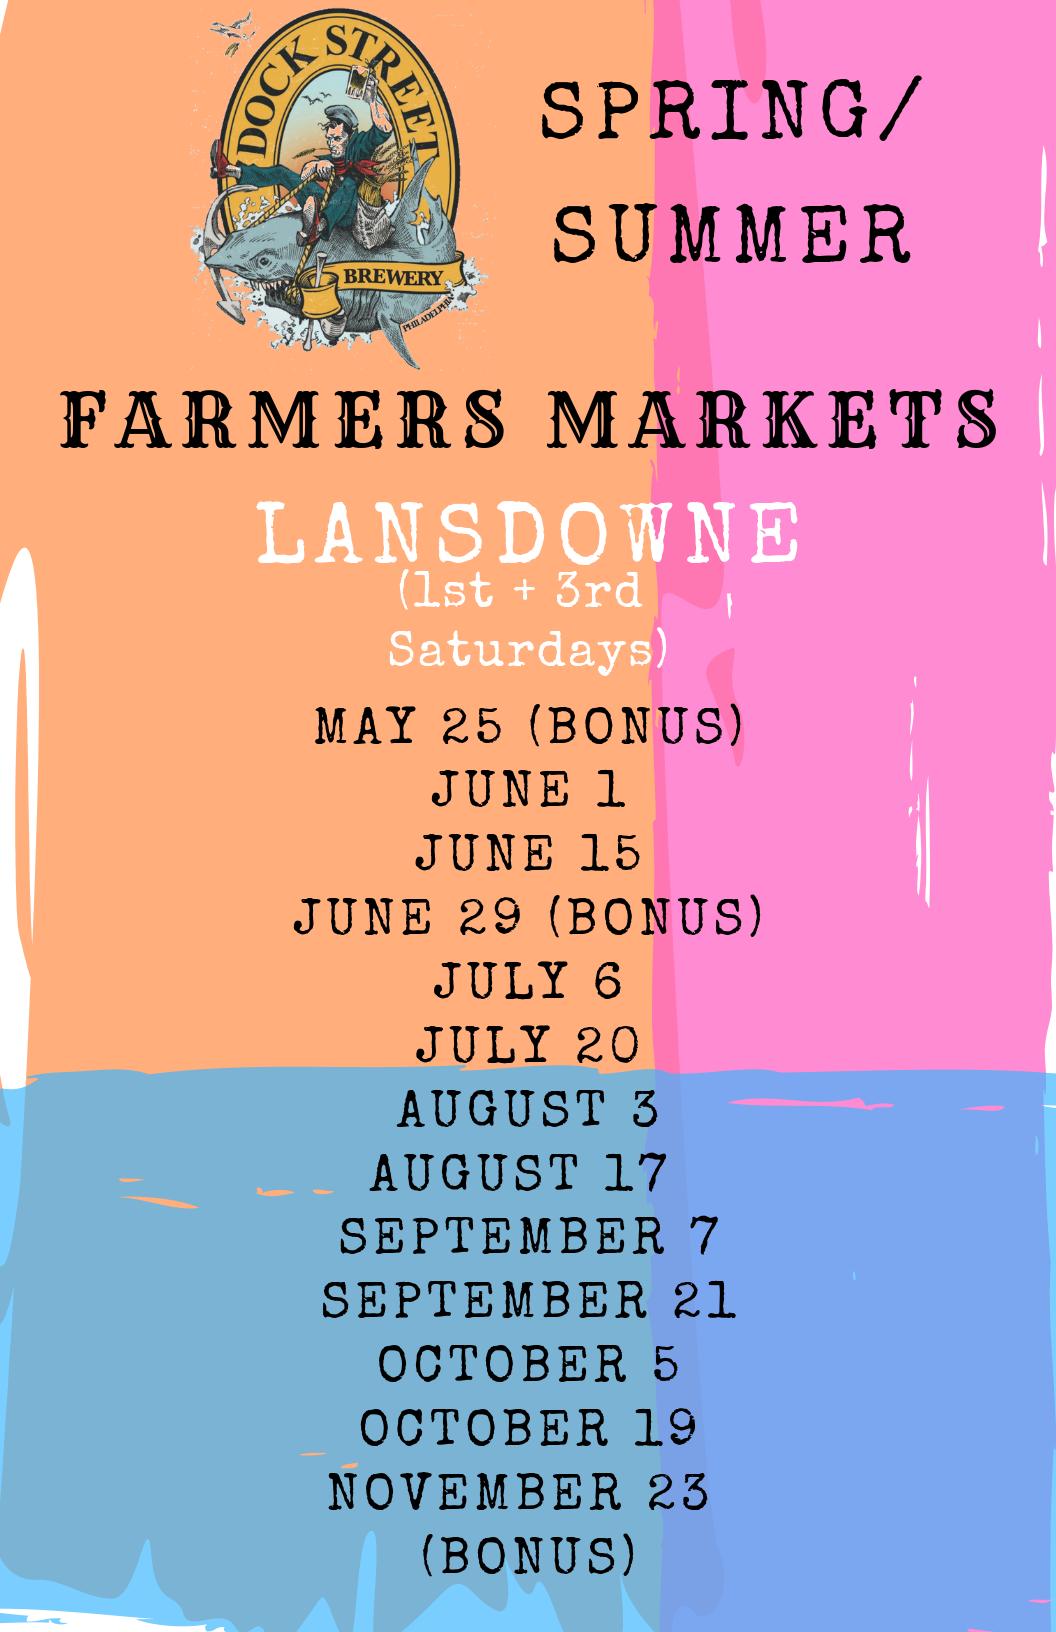 farmers markets 2019 LANSDOWNE.png